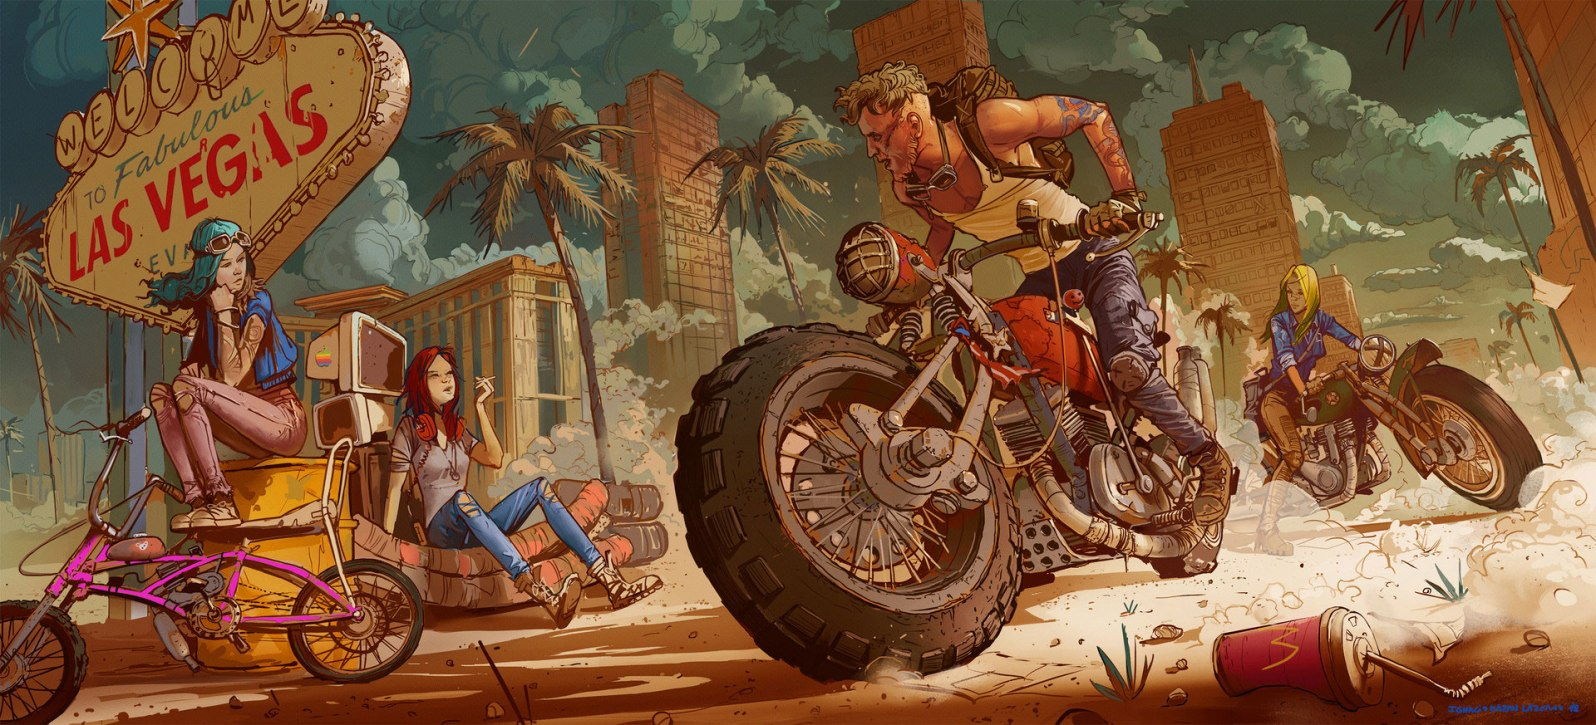 Quelle: neisbeis.artstation.com - Ignacio Bazan-Lazcano - bike 3